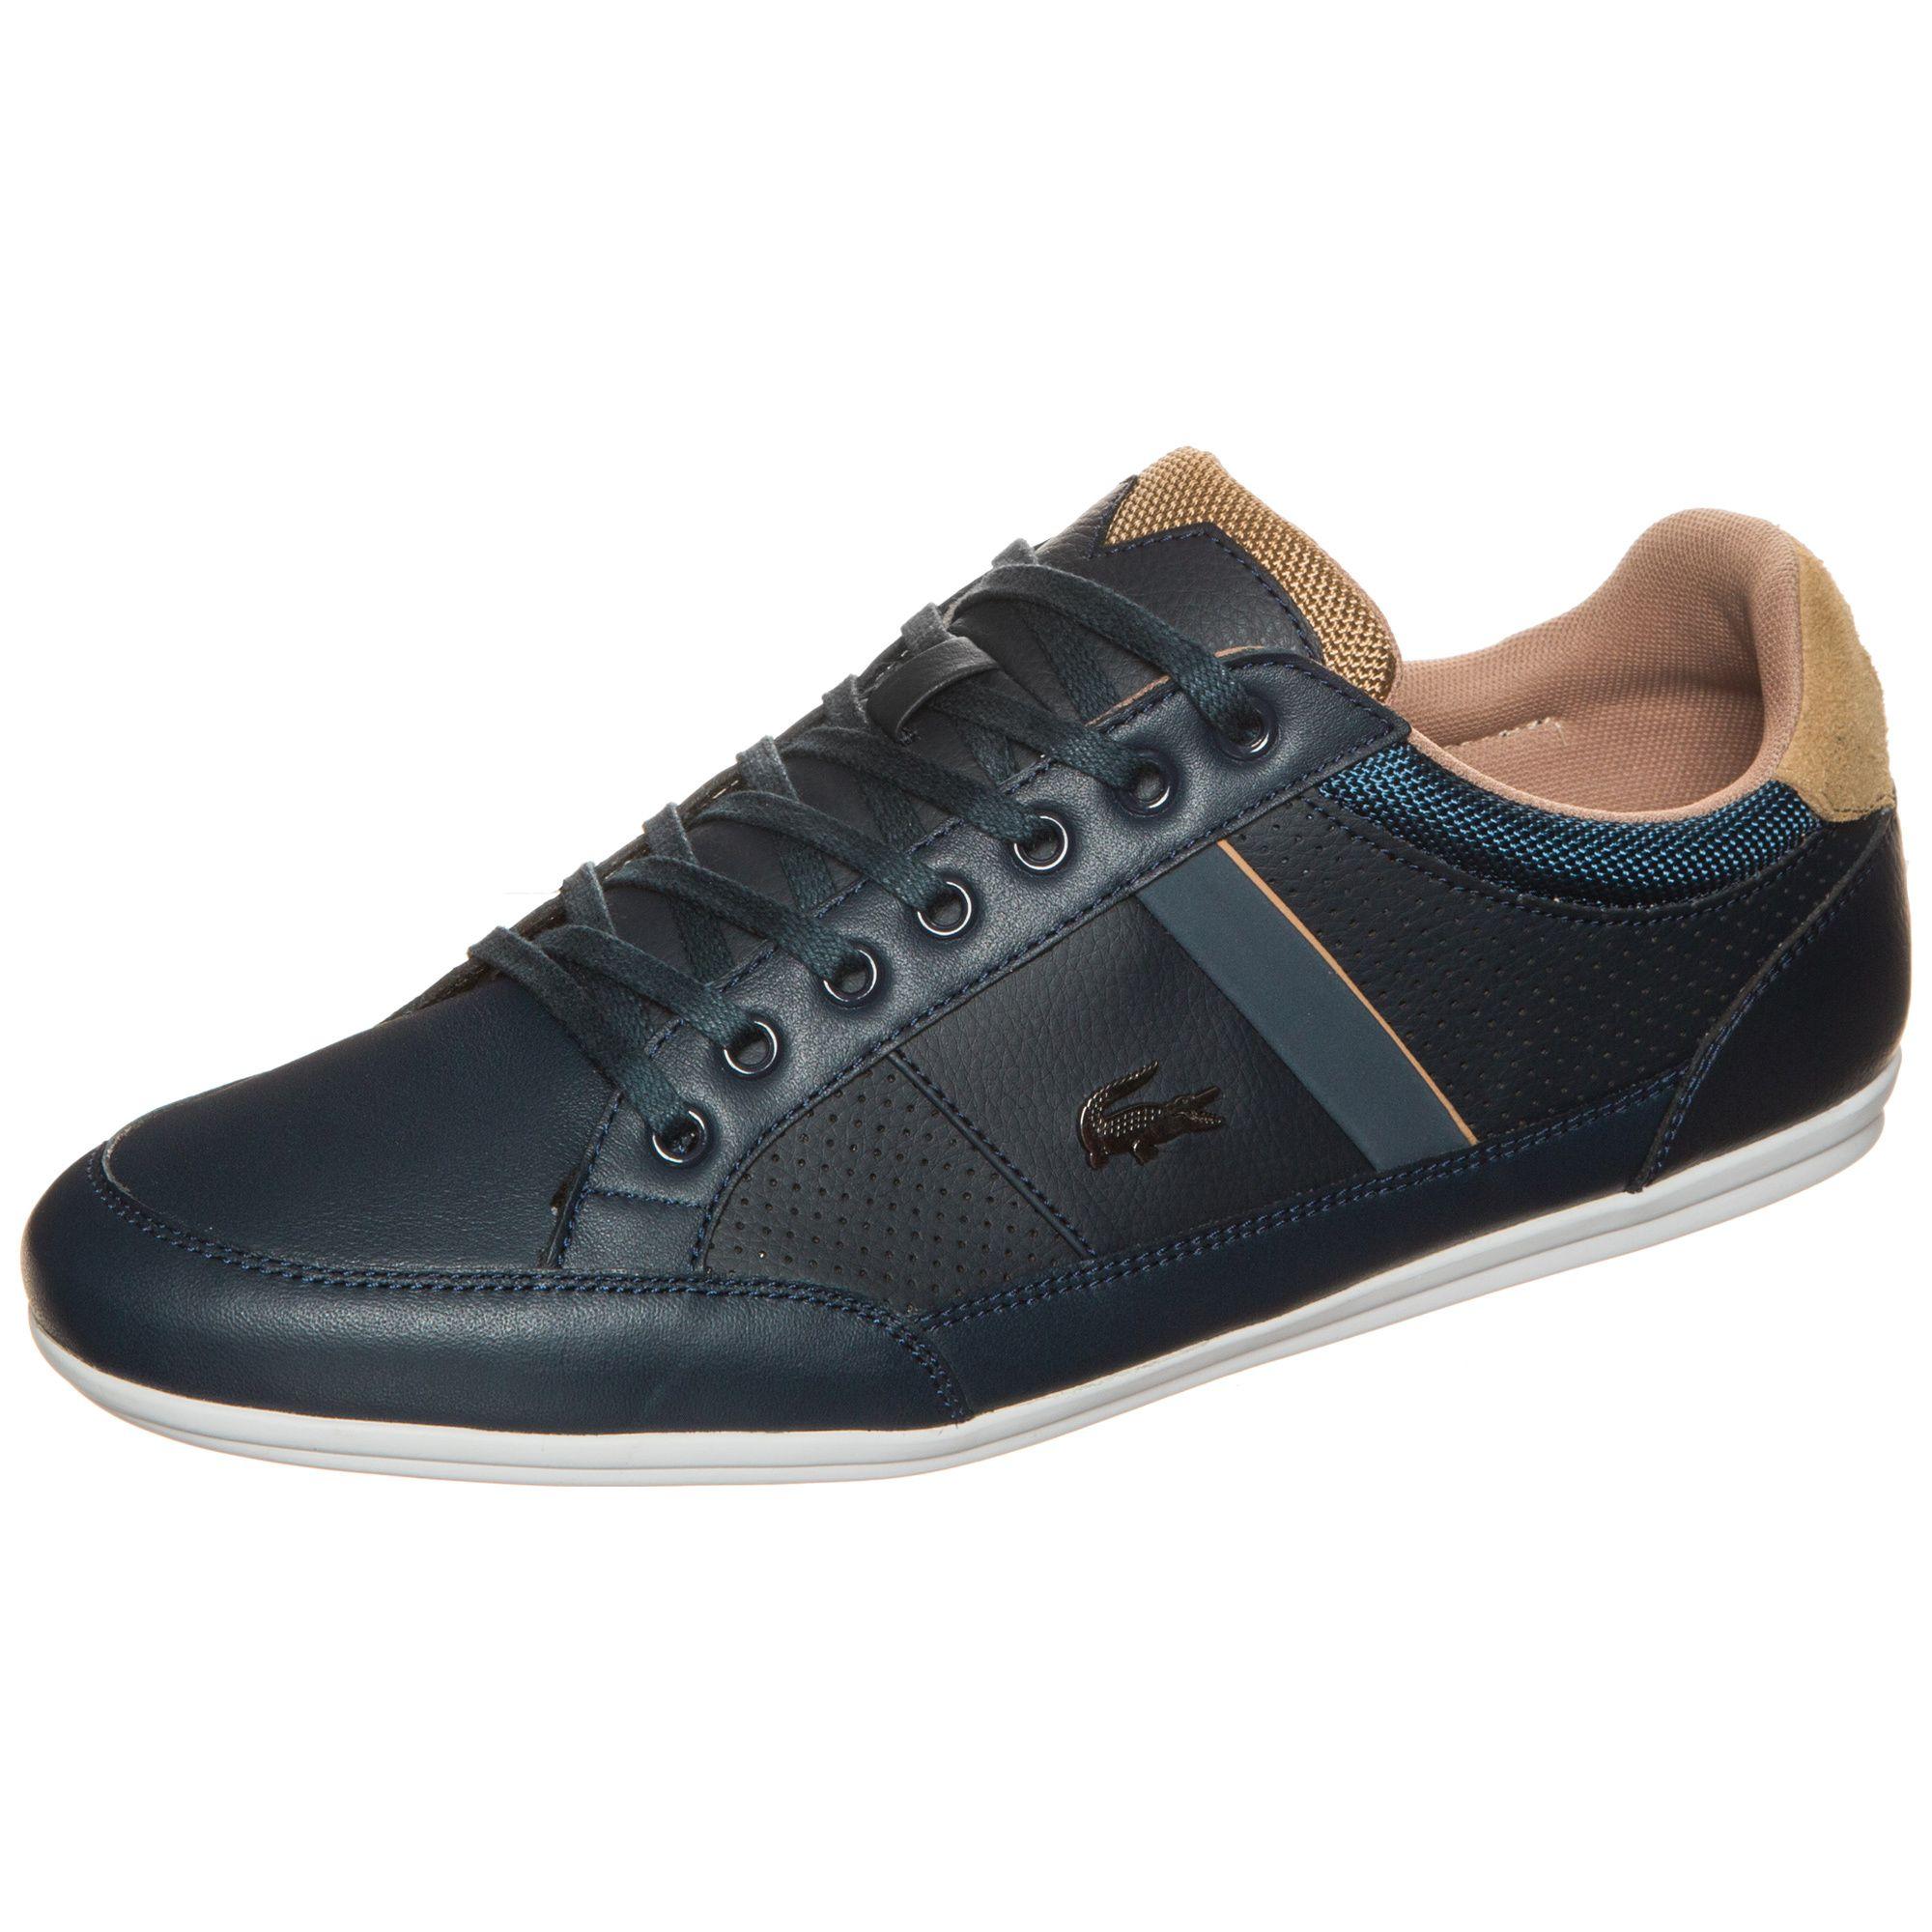 Buty Meskie Lacoste Chaymon 117 Granat 40 47 47 6832006652 Oficjalne Archiwum Allegro Lacoste Shoes Sneakers